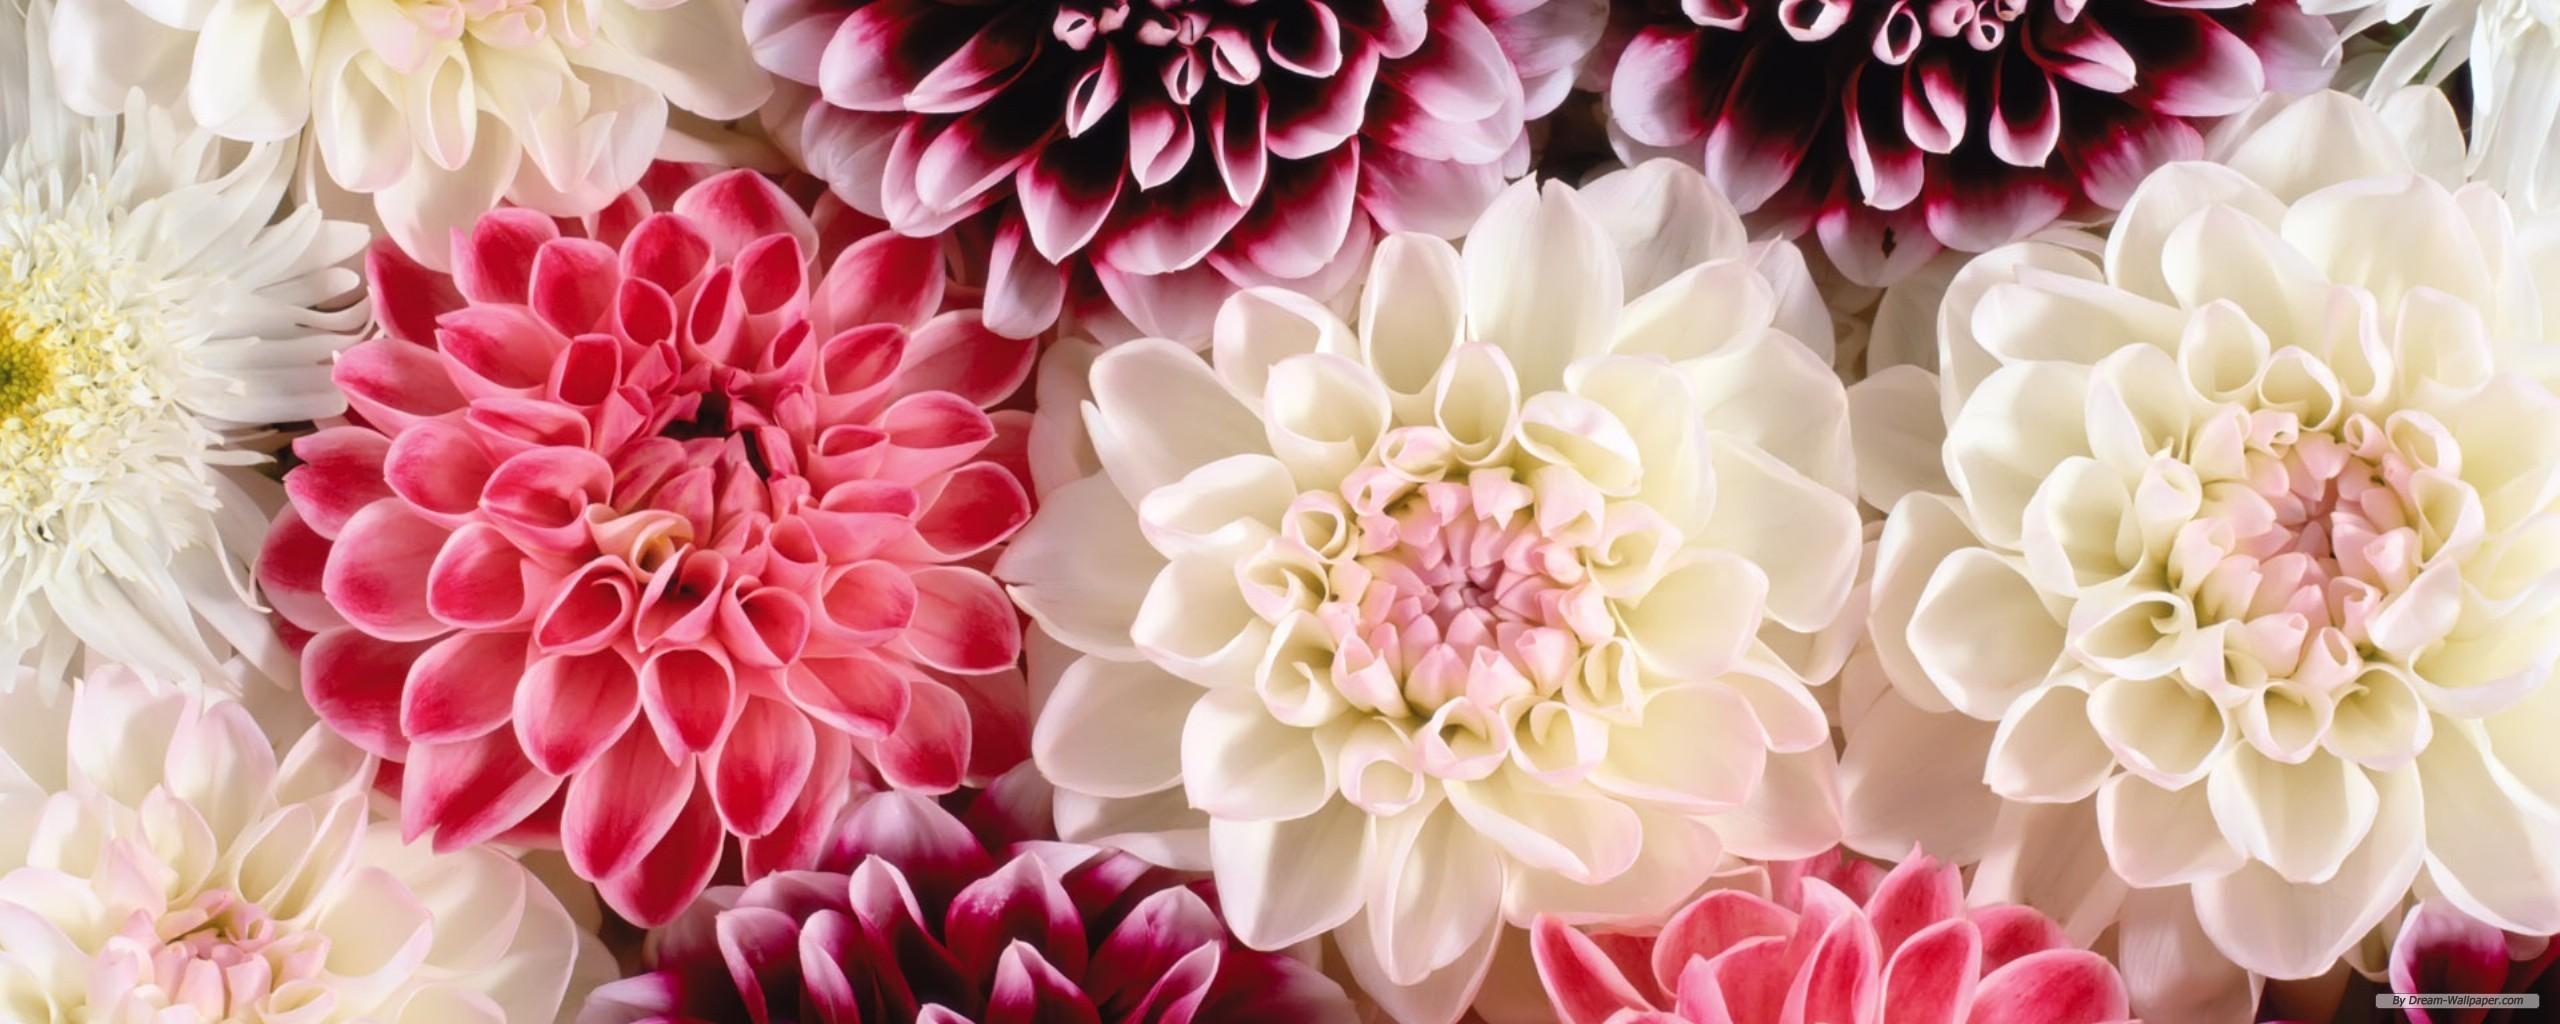 77 Flower Screen Backgrounds On Wallpapersafari